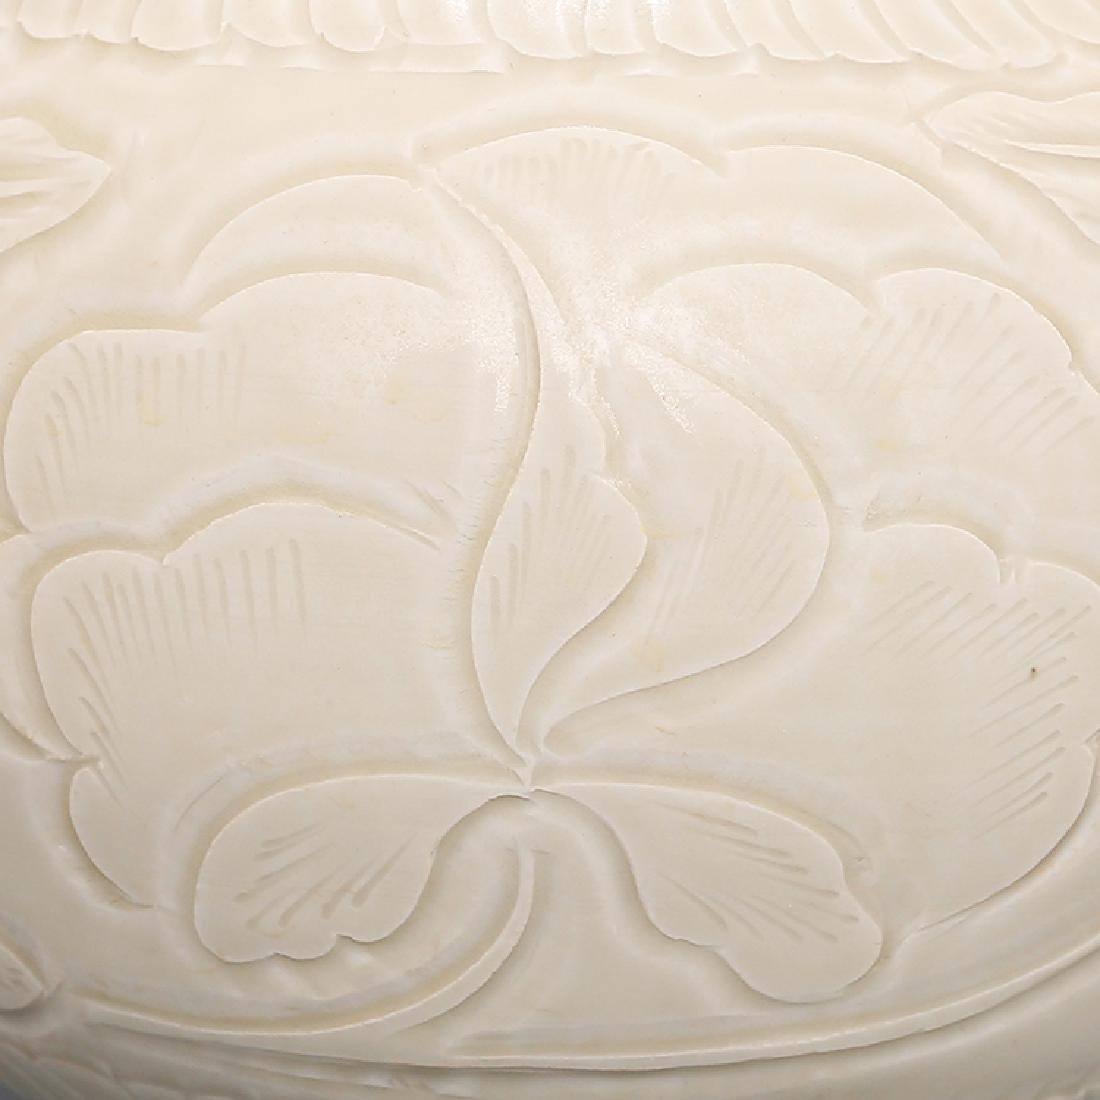 Chinese Ding Kiln Porcelain  Ginger Jar - 3